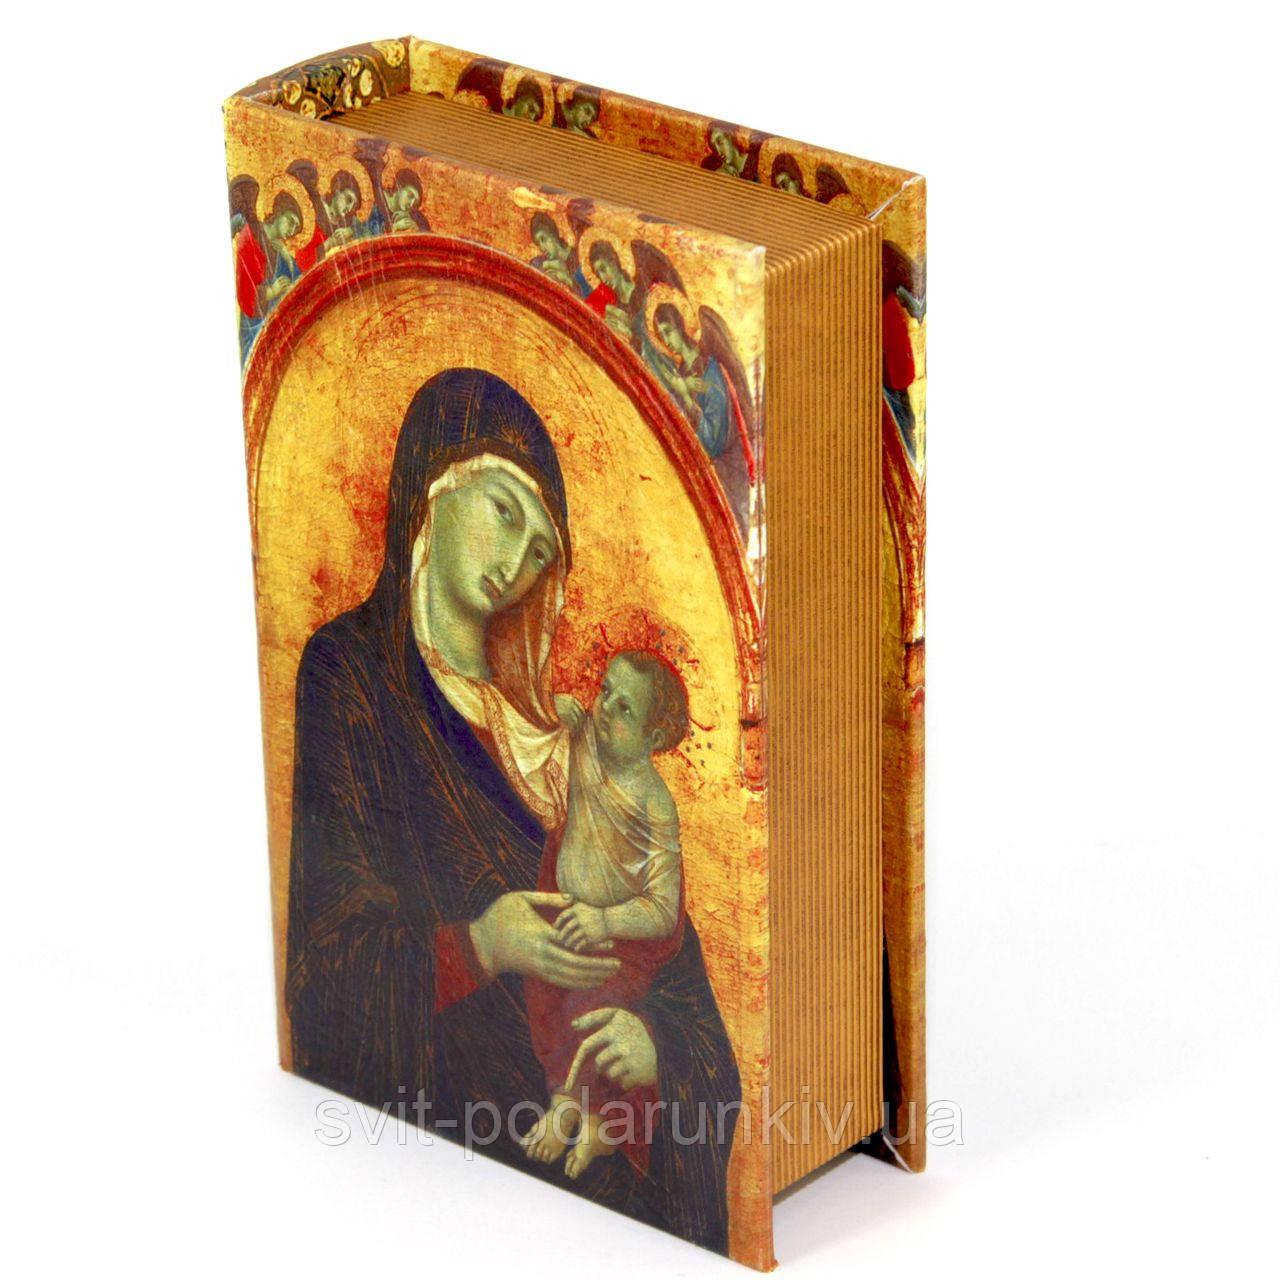 "Шкатулка книга ""St Maria"" большая"